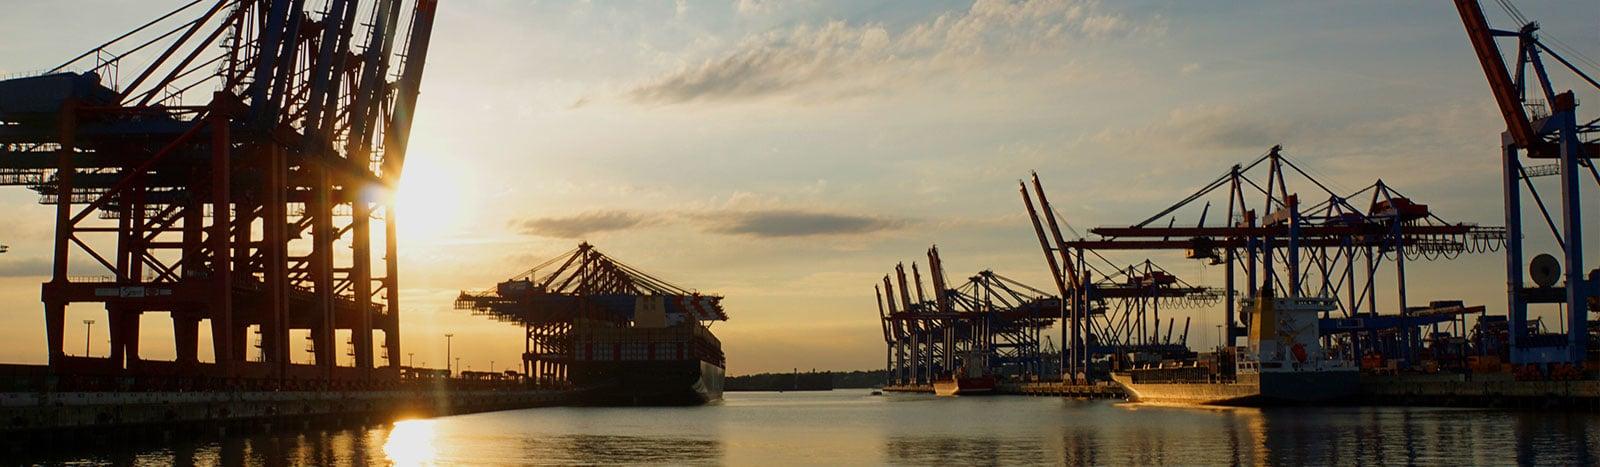 Hafen Hamburg Videoüberwachung